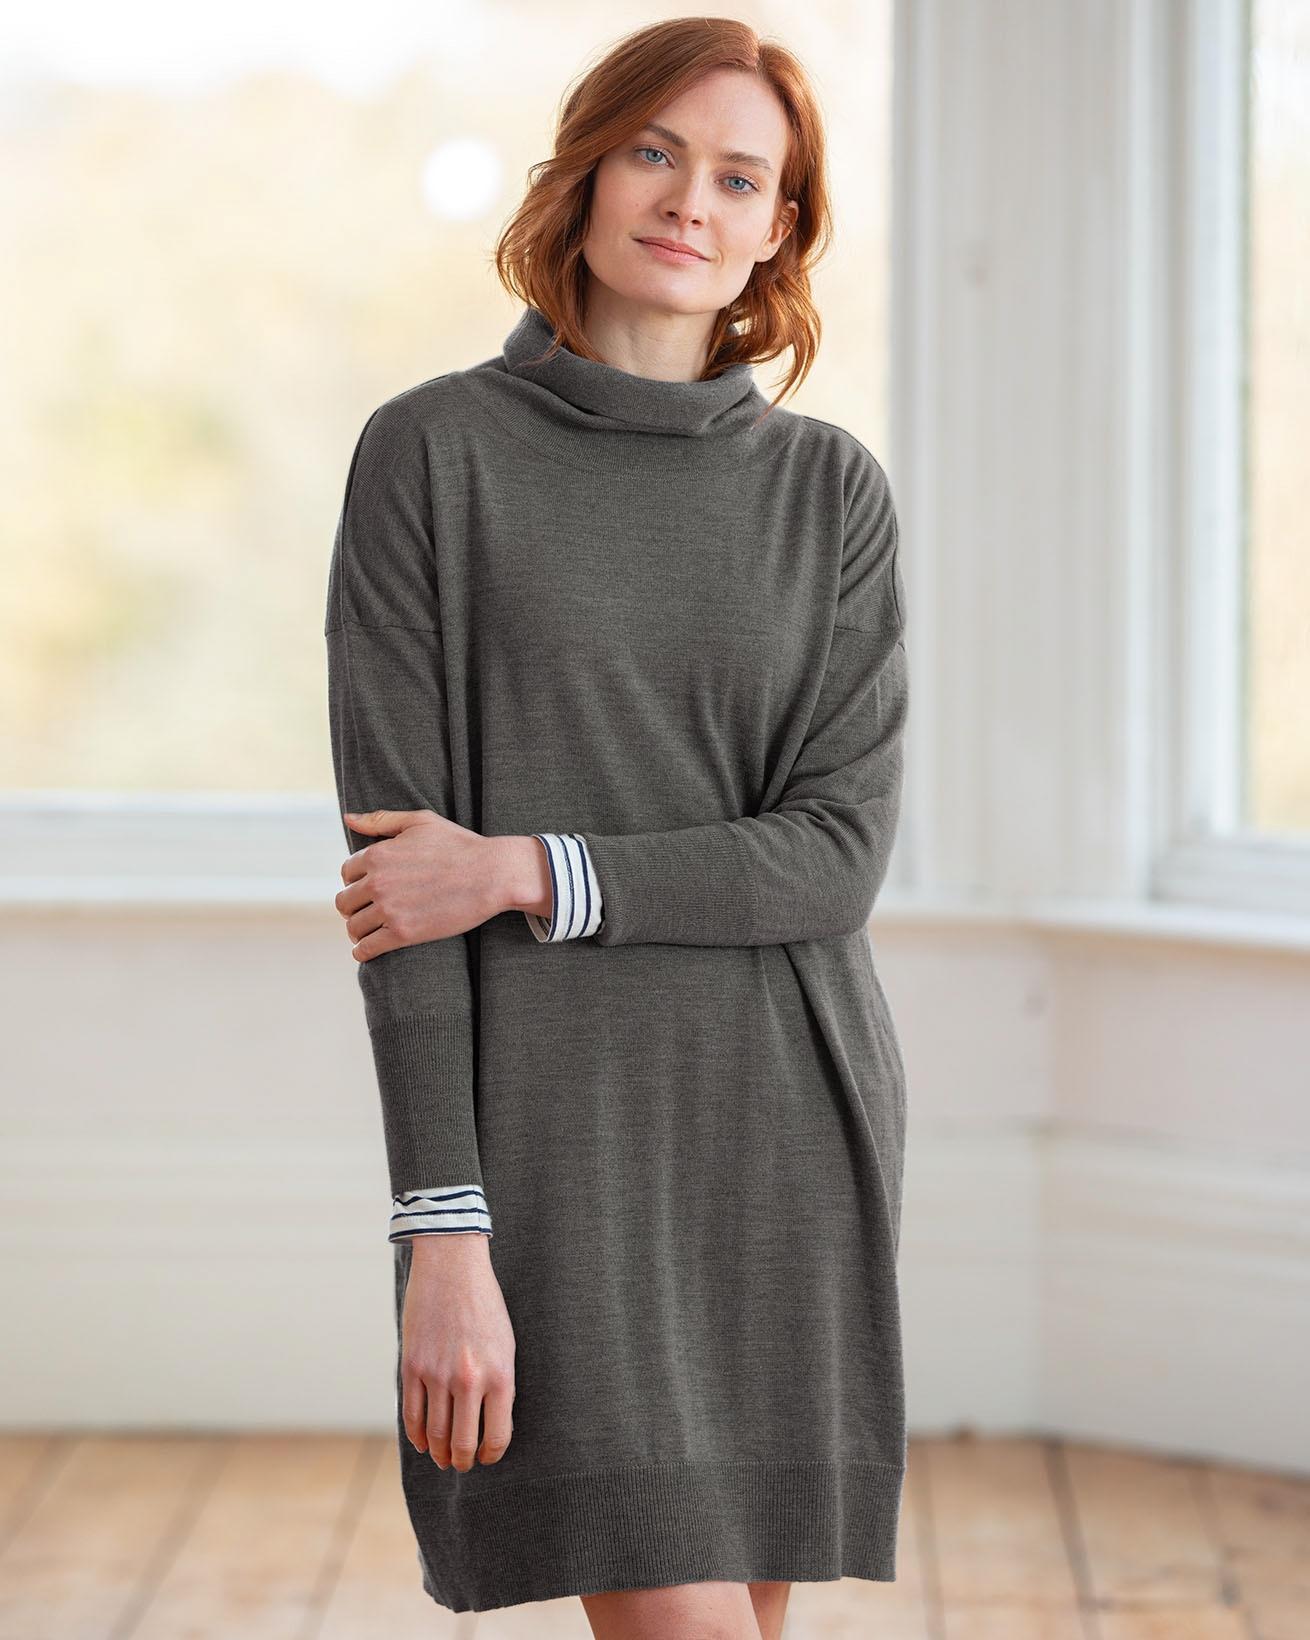 Slouchy Fine Knit Roll Neck Dress